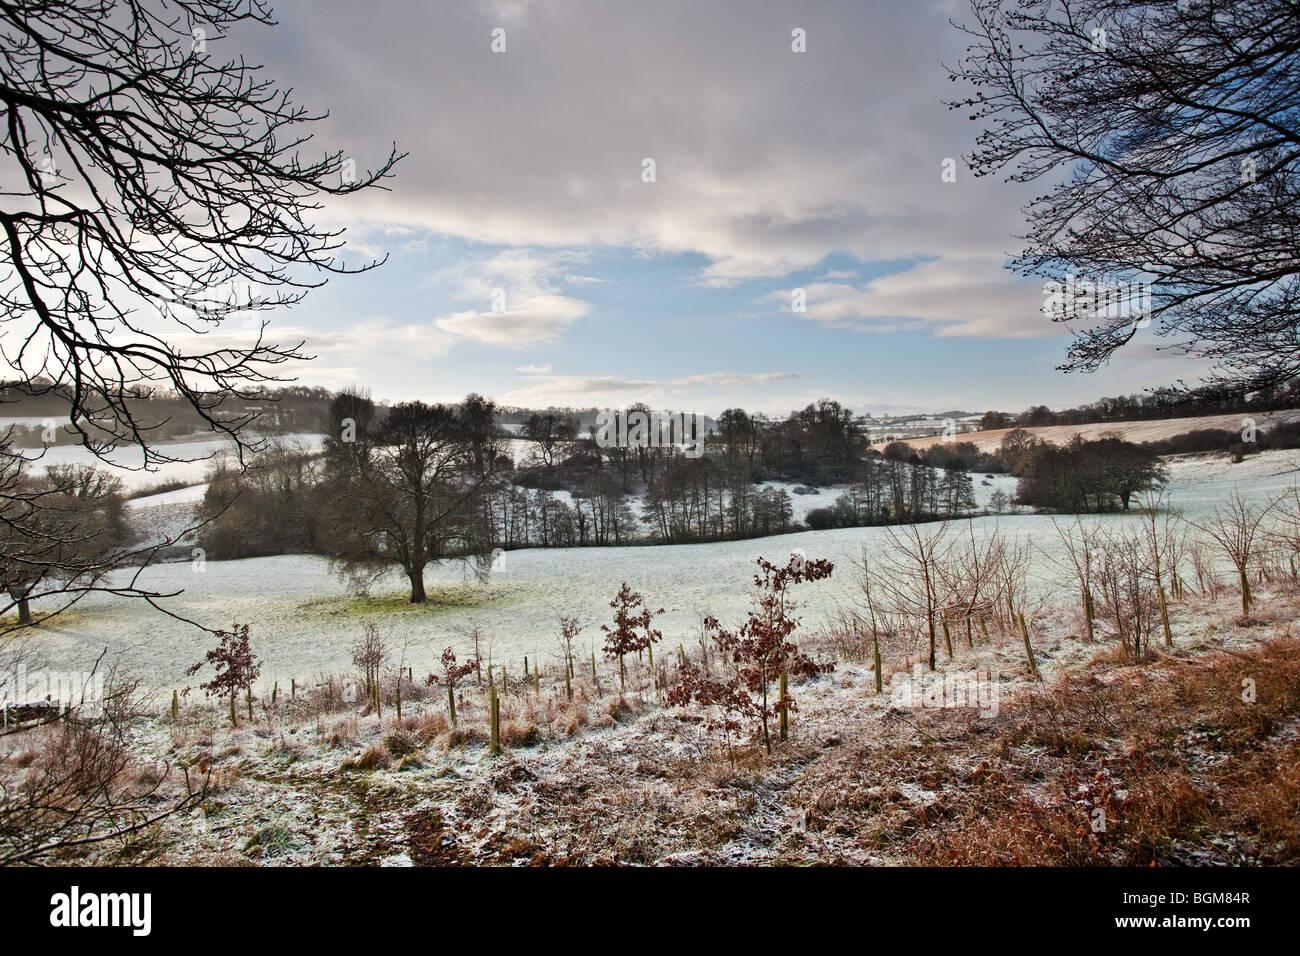 winter landscape - Stock Image